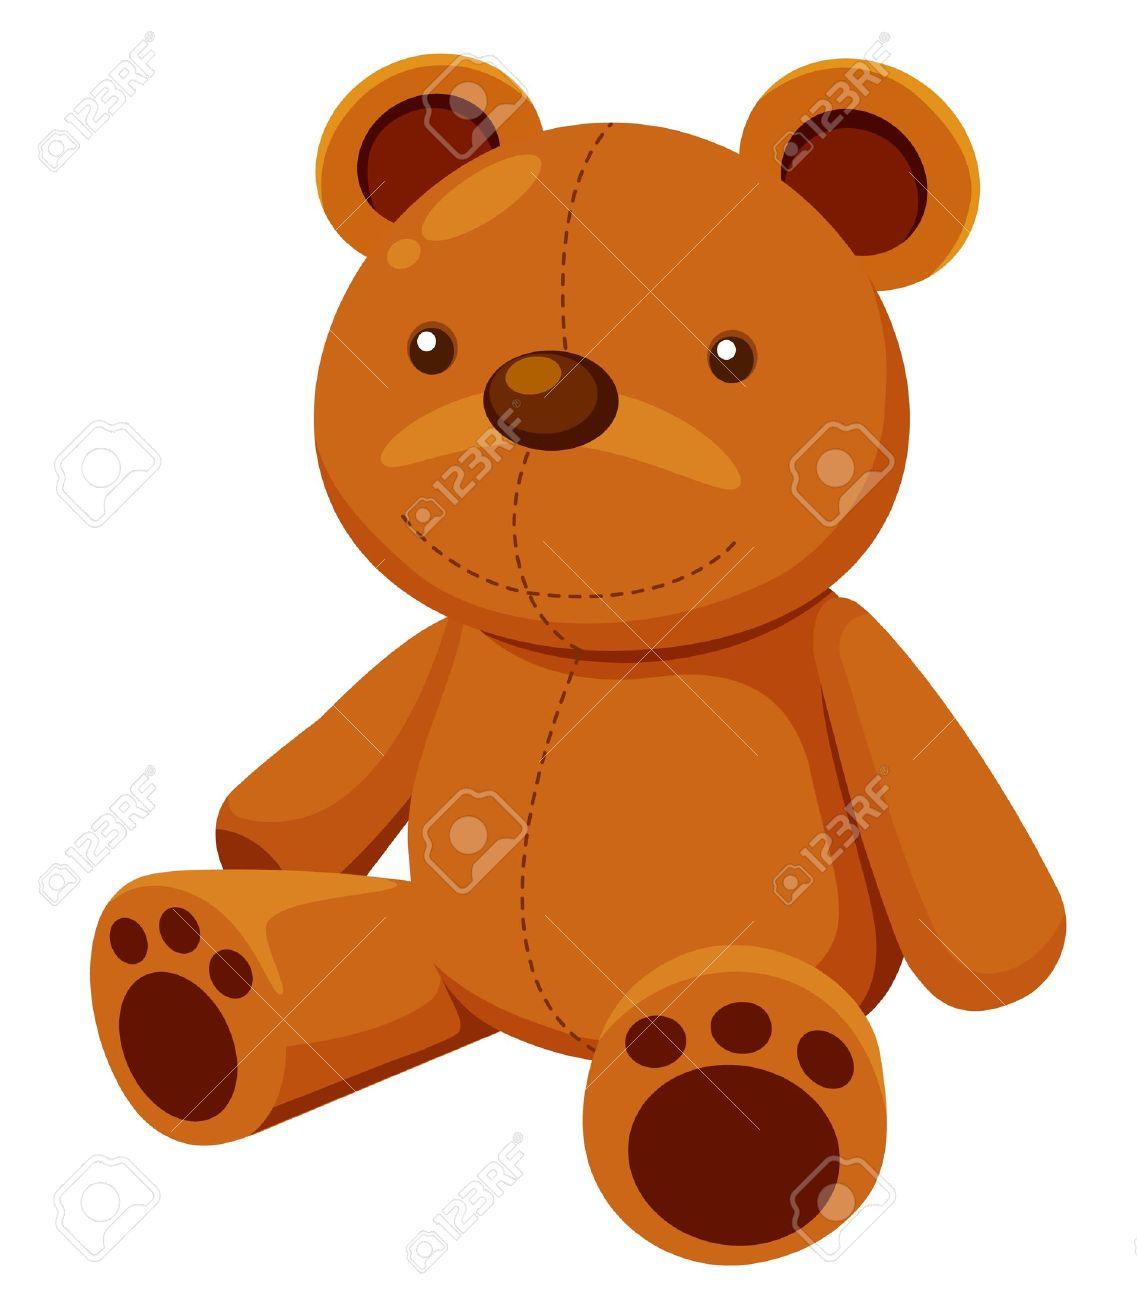 illustration of Teddy bear Stock Vector - 15623144